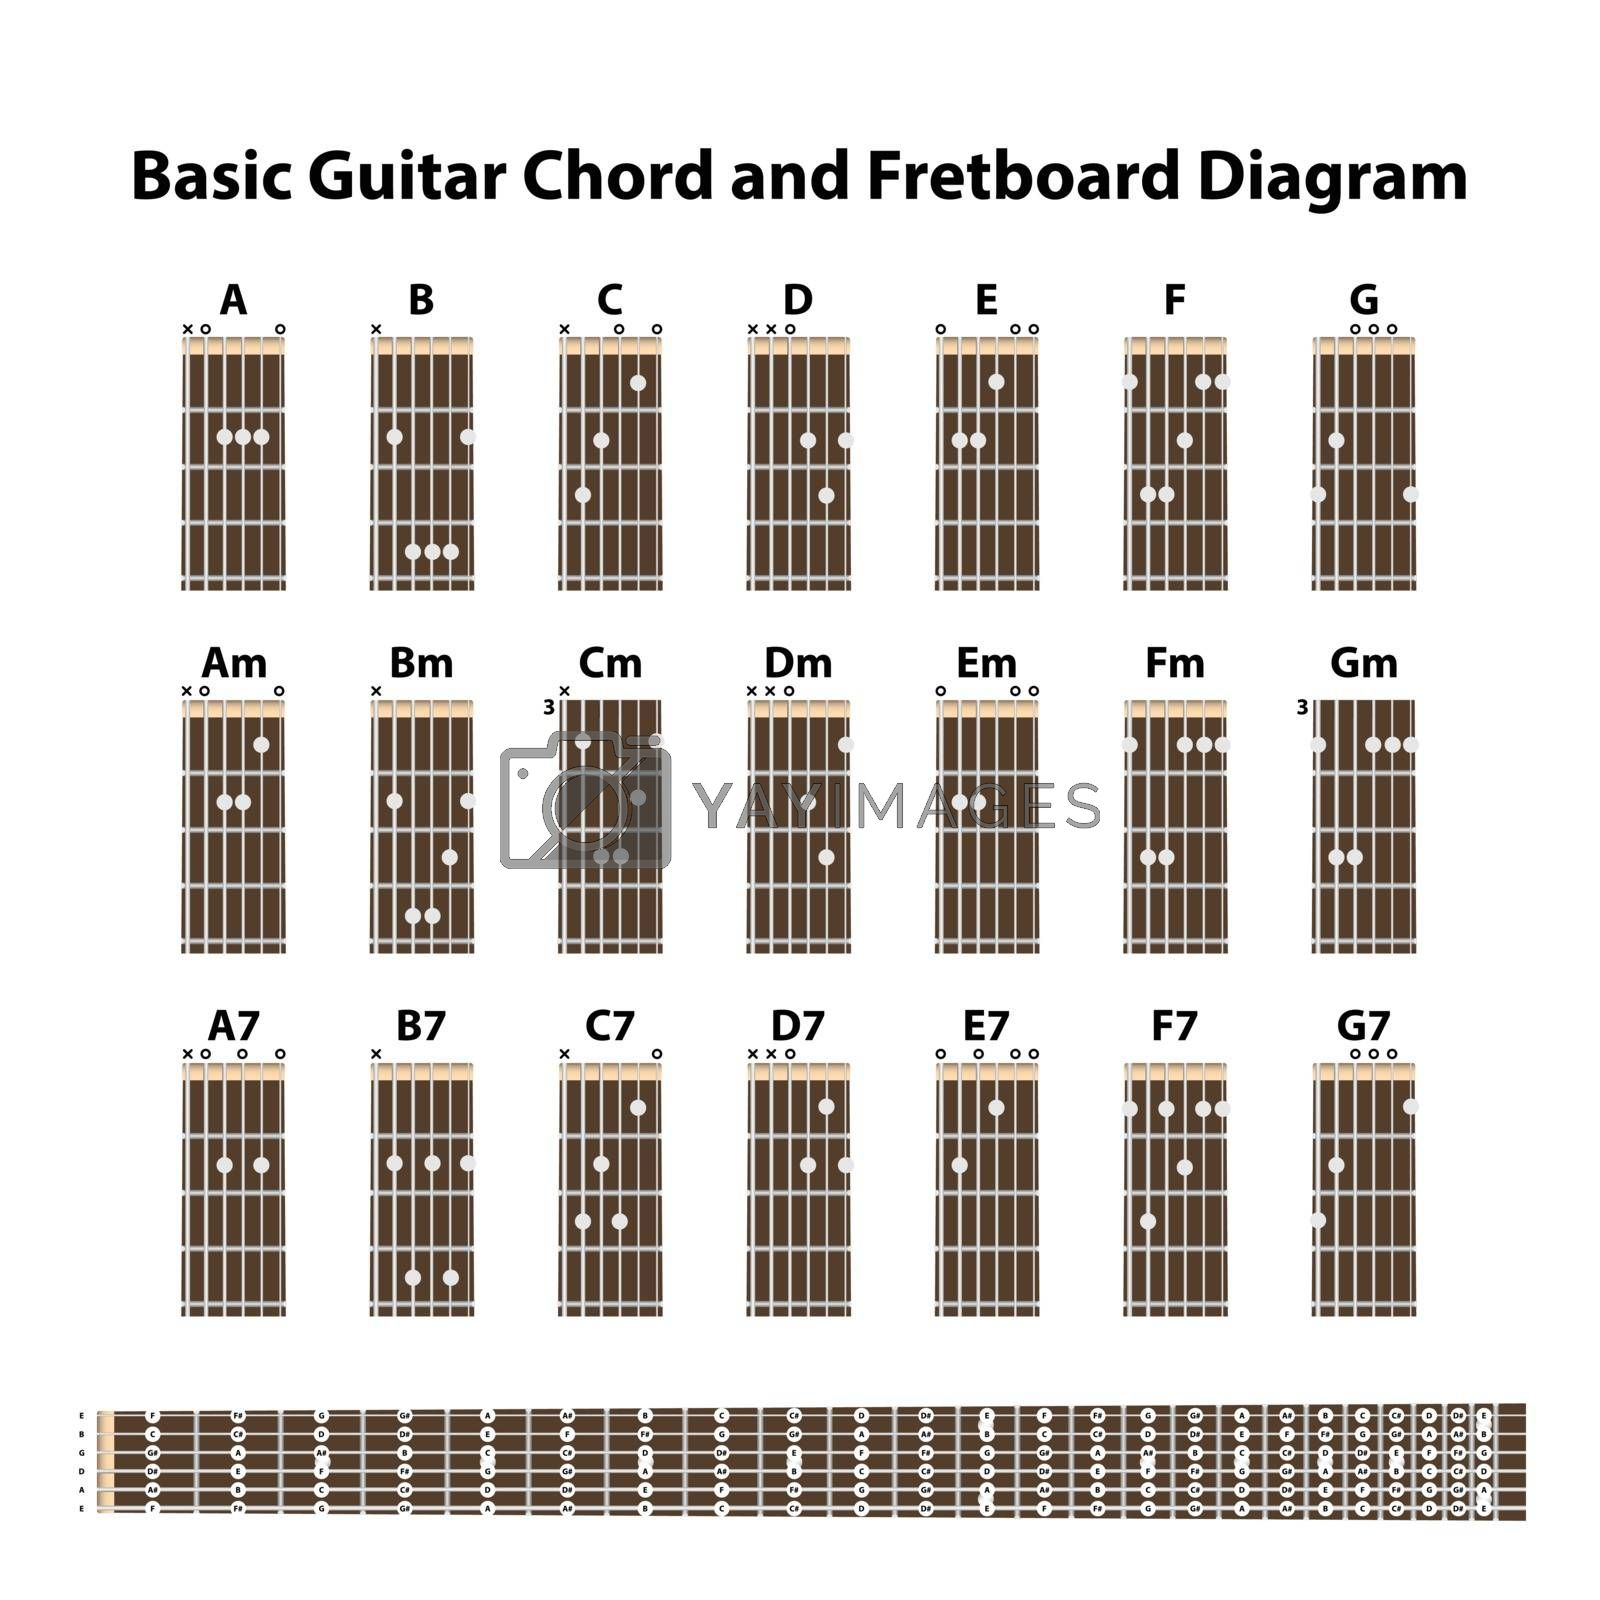 Basic Guitar chord and fretboard diagram, vector illustration